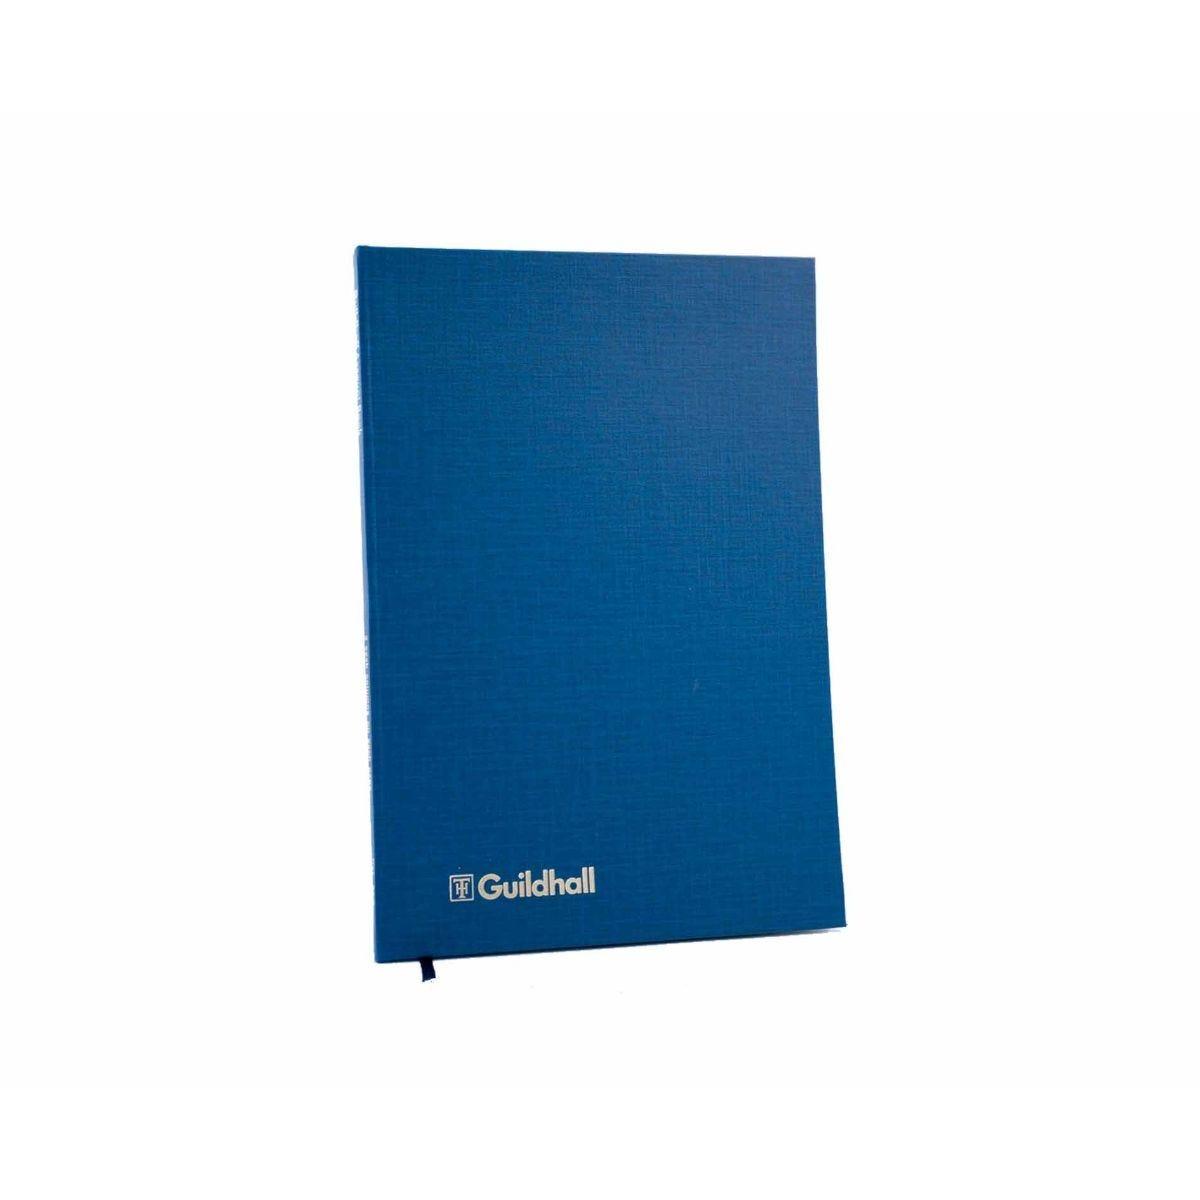 Guildhall Account Book 31 Series 10 Column A4